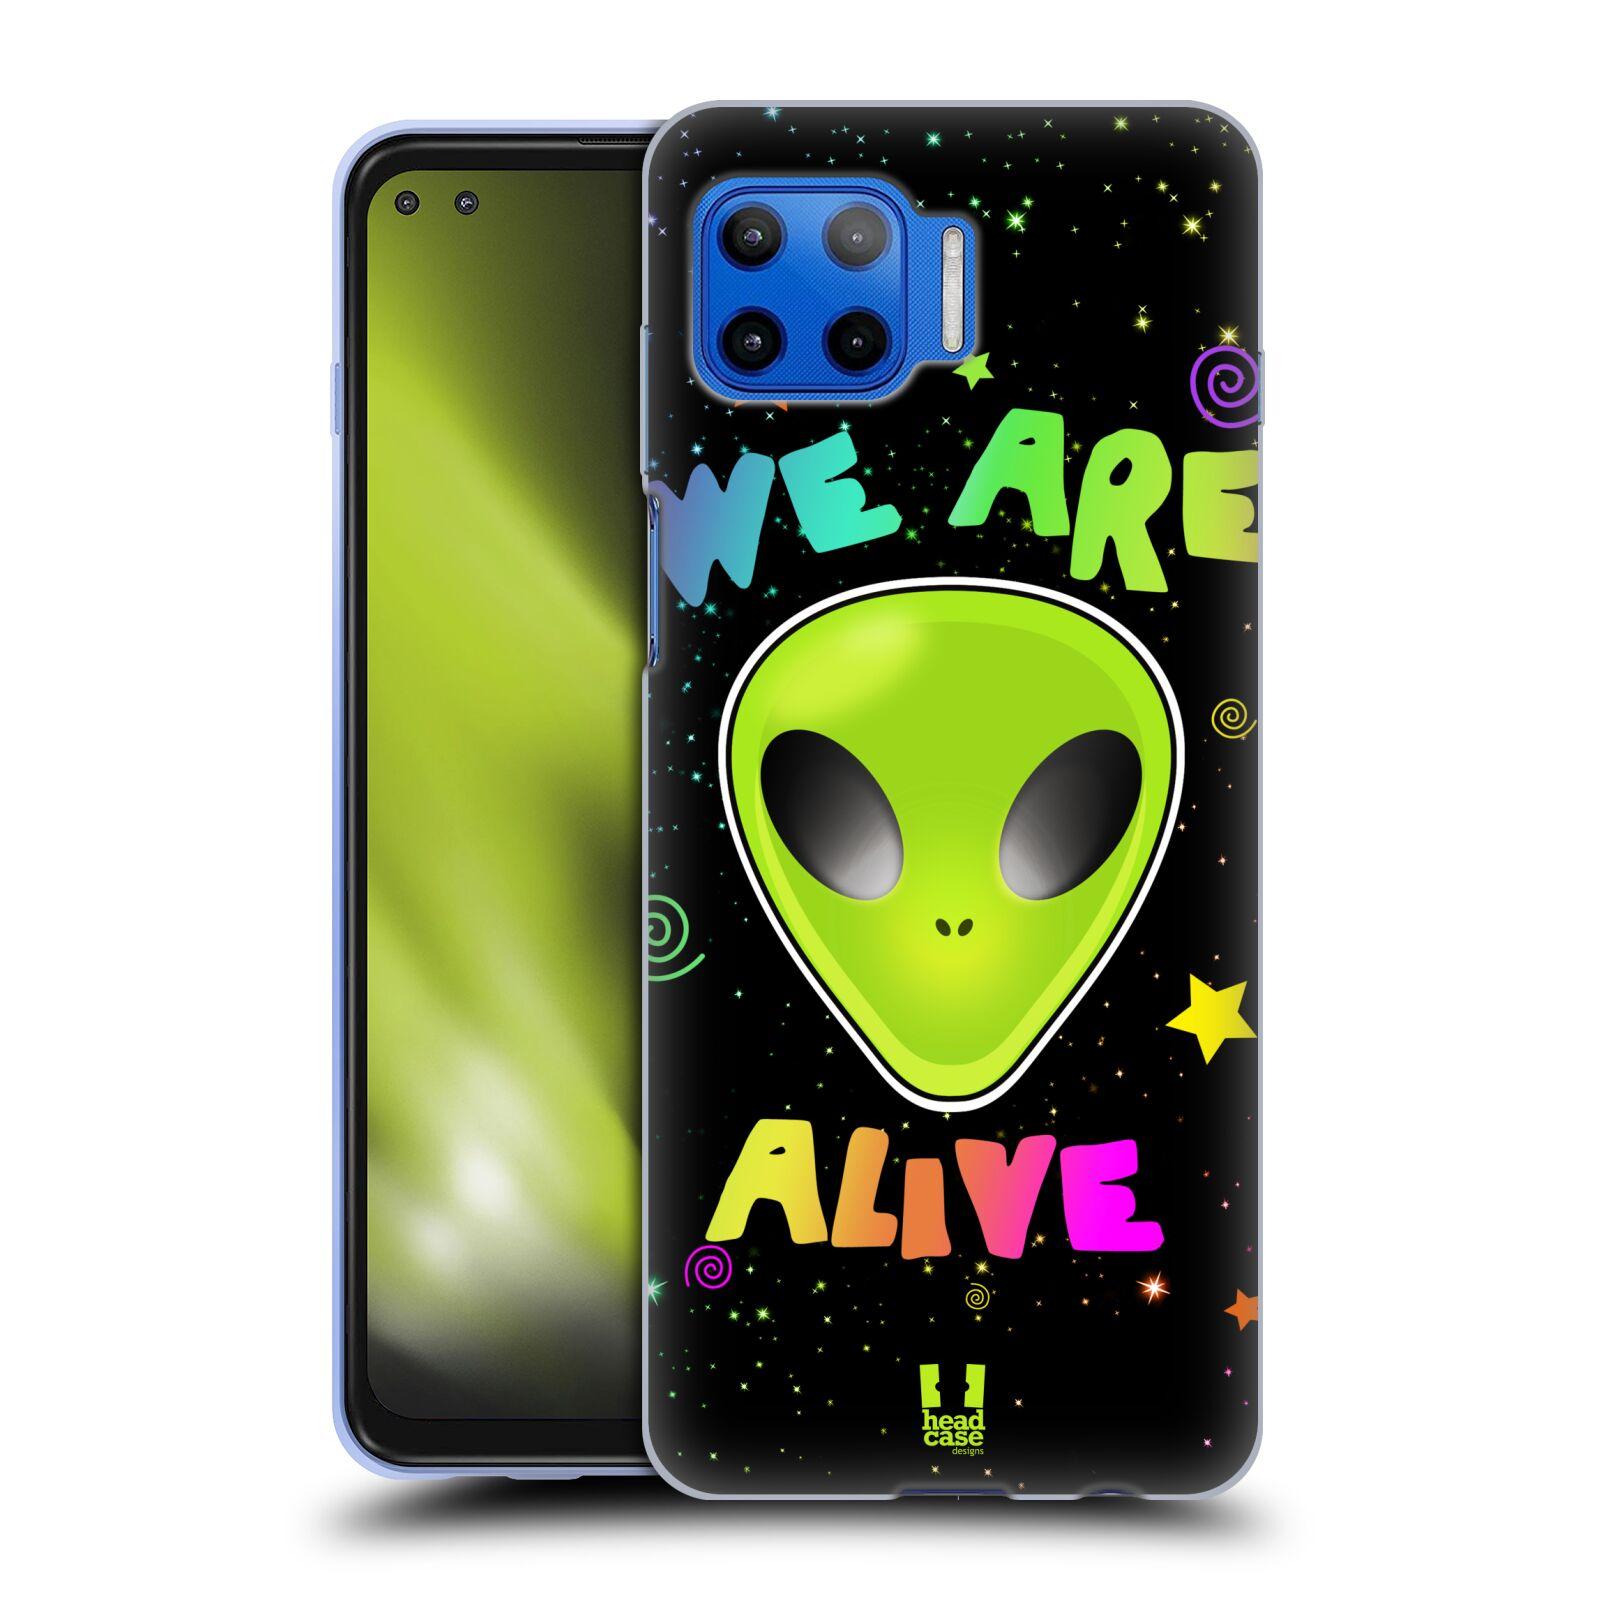 Silikonové pouzdro na mobil Motorola Moto G 5G Plus - Head Case - ALIENS ALIVE